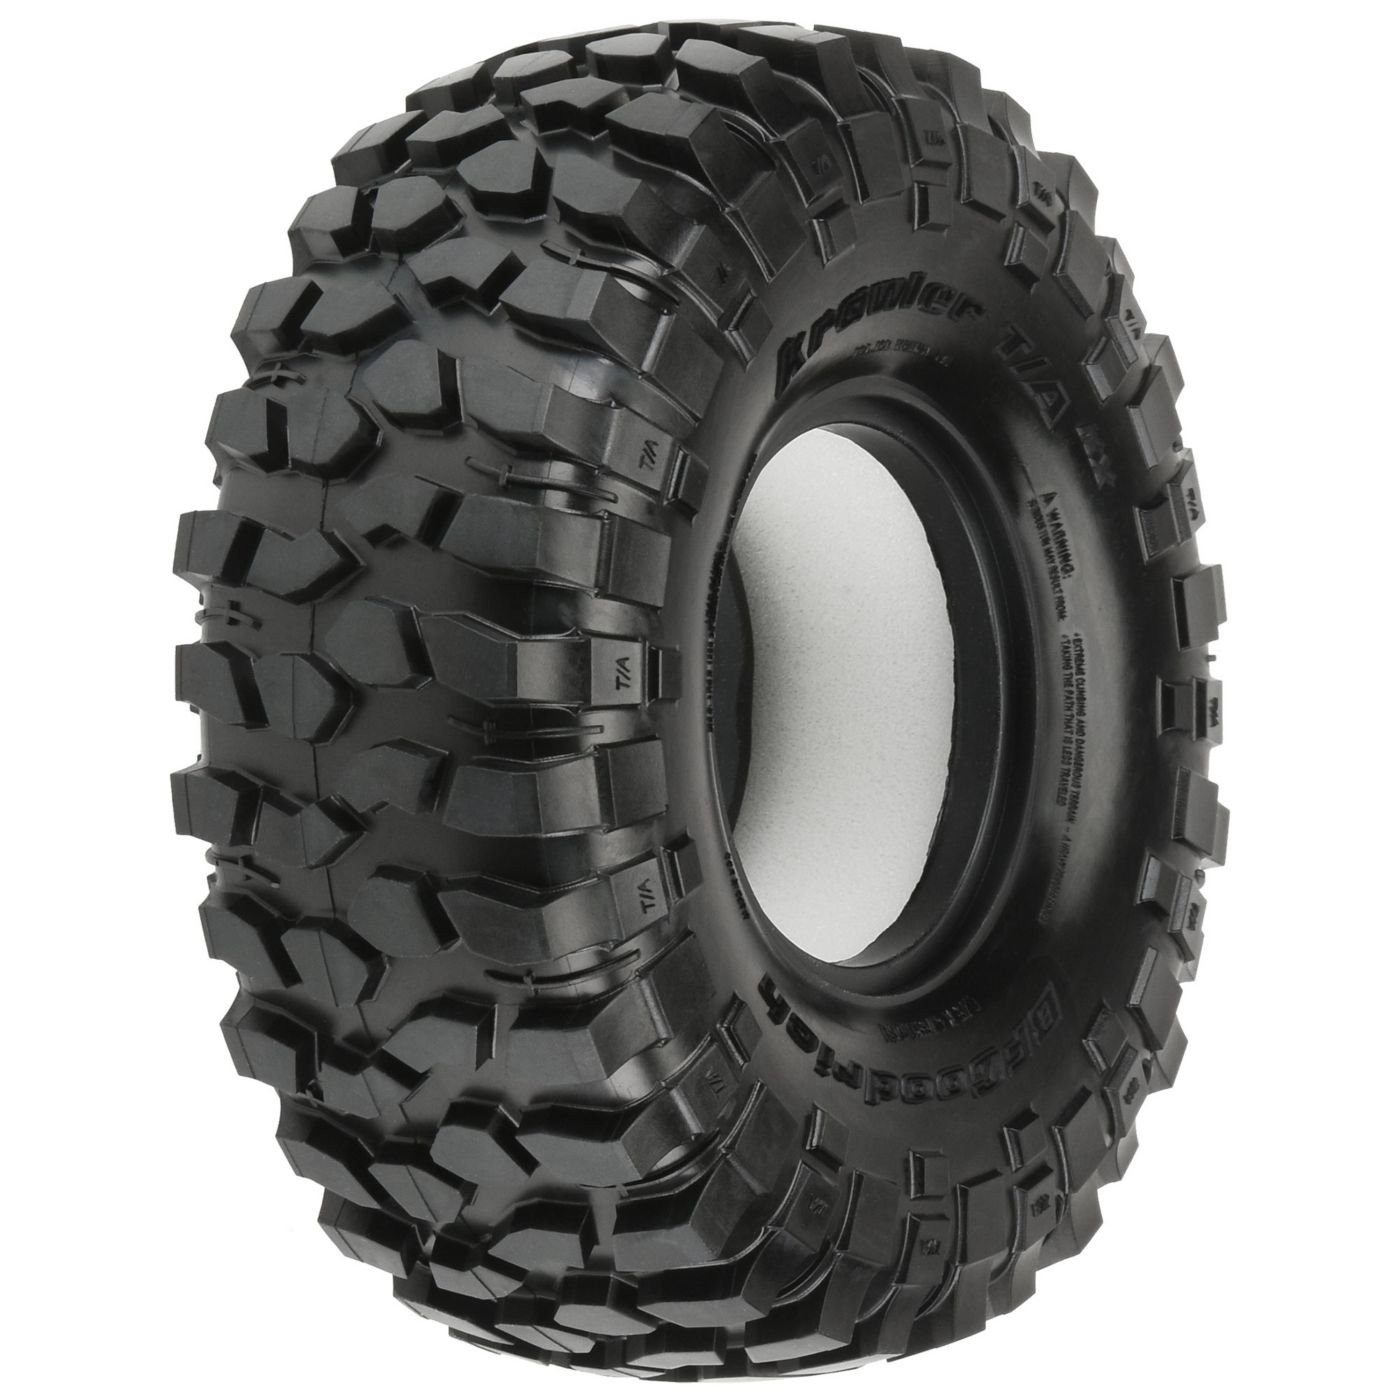 Bf Goodrich Truck Tires >> Bfgoodrich Krawler T A Kx 1 9 G8 Rock Terrain Truck Tires 2 1013614